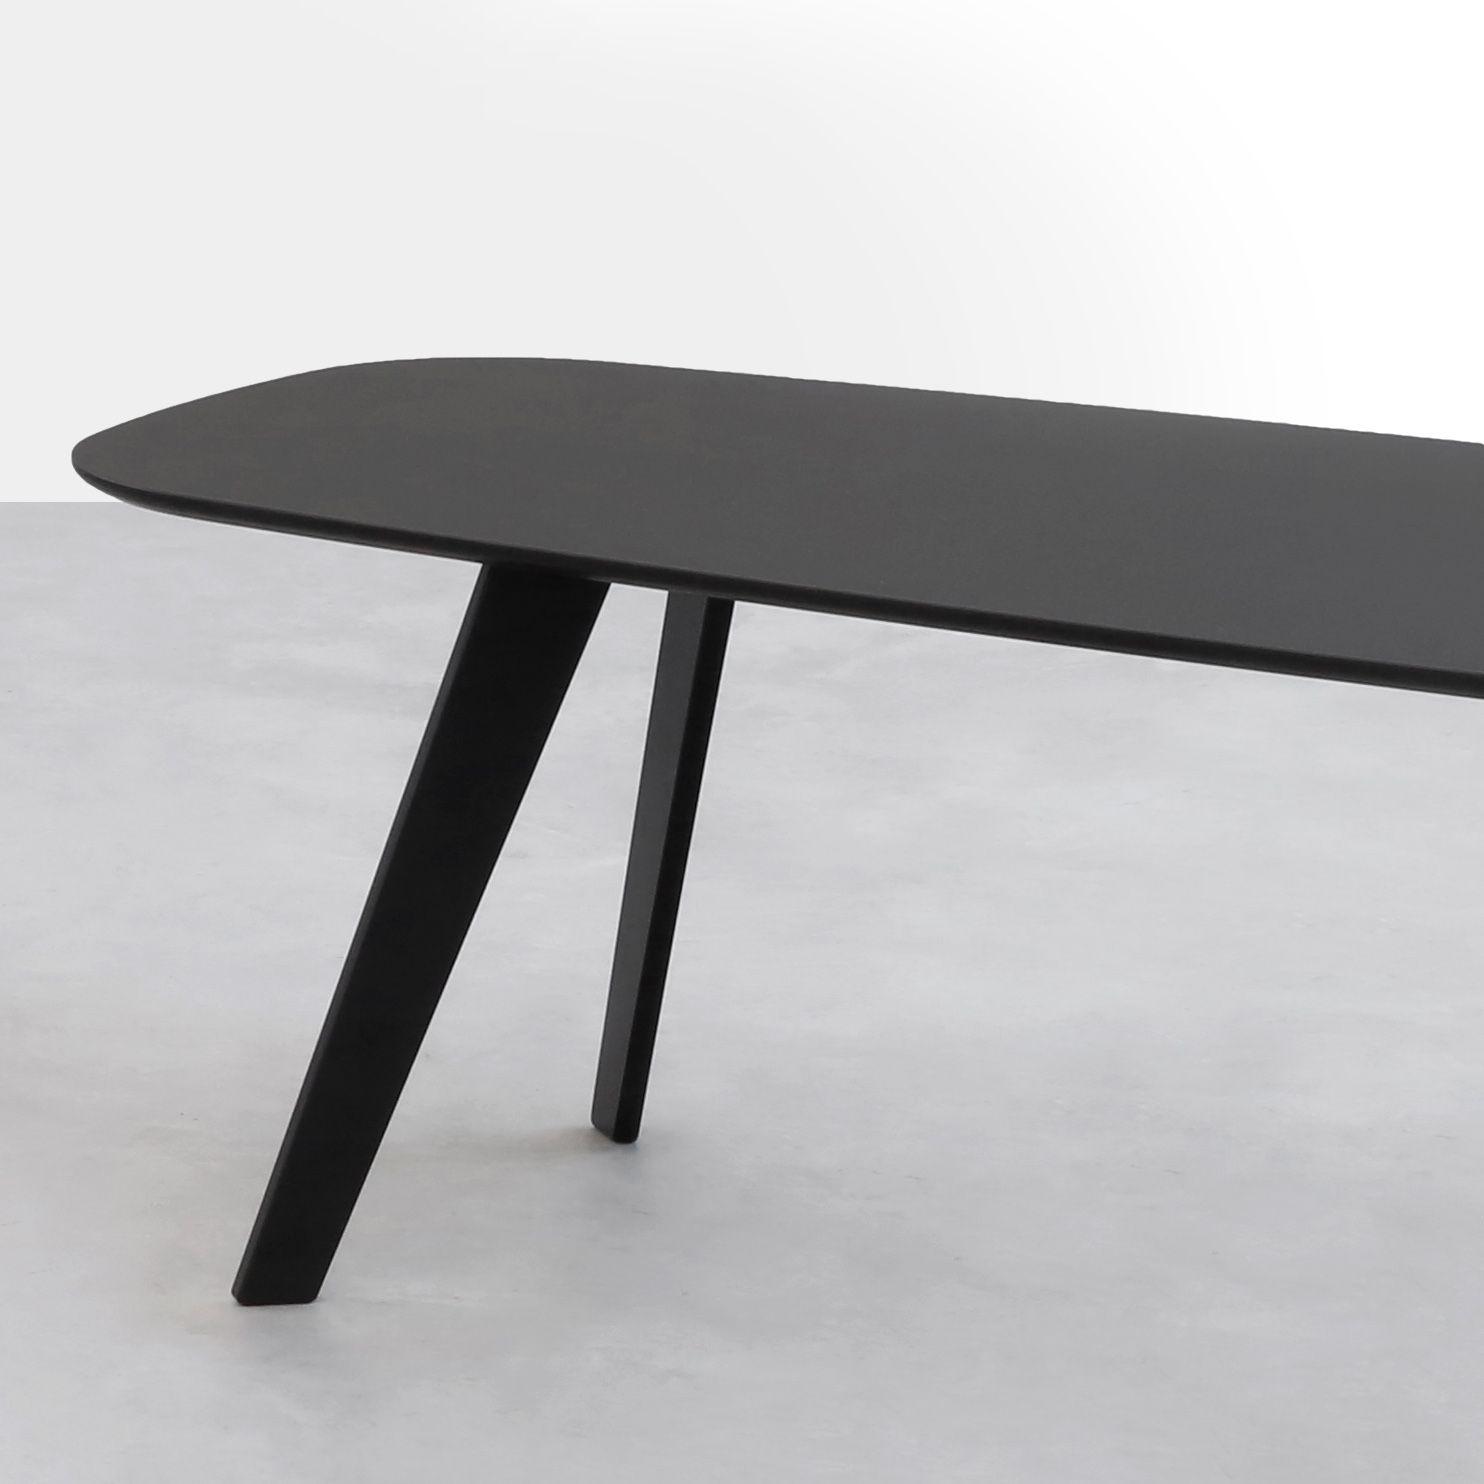 Stua Solapa Tables-Fenix